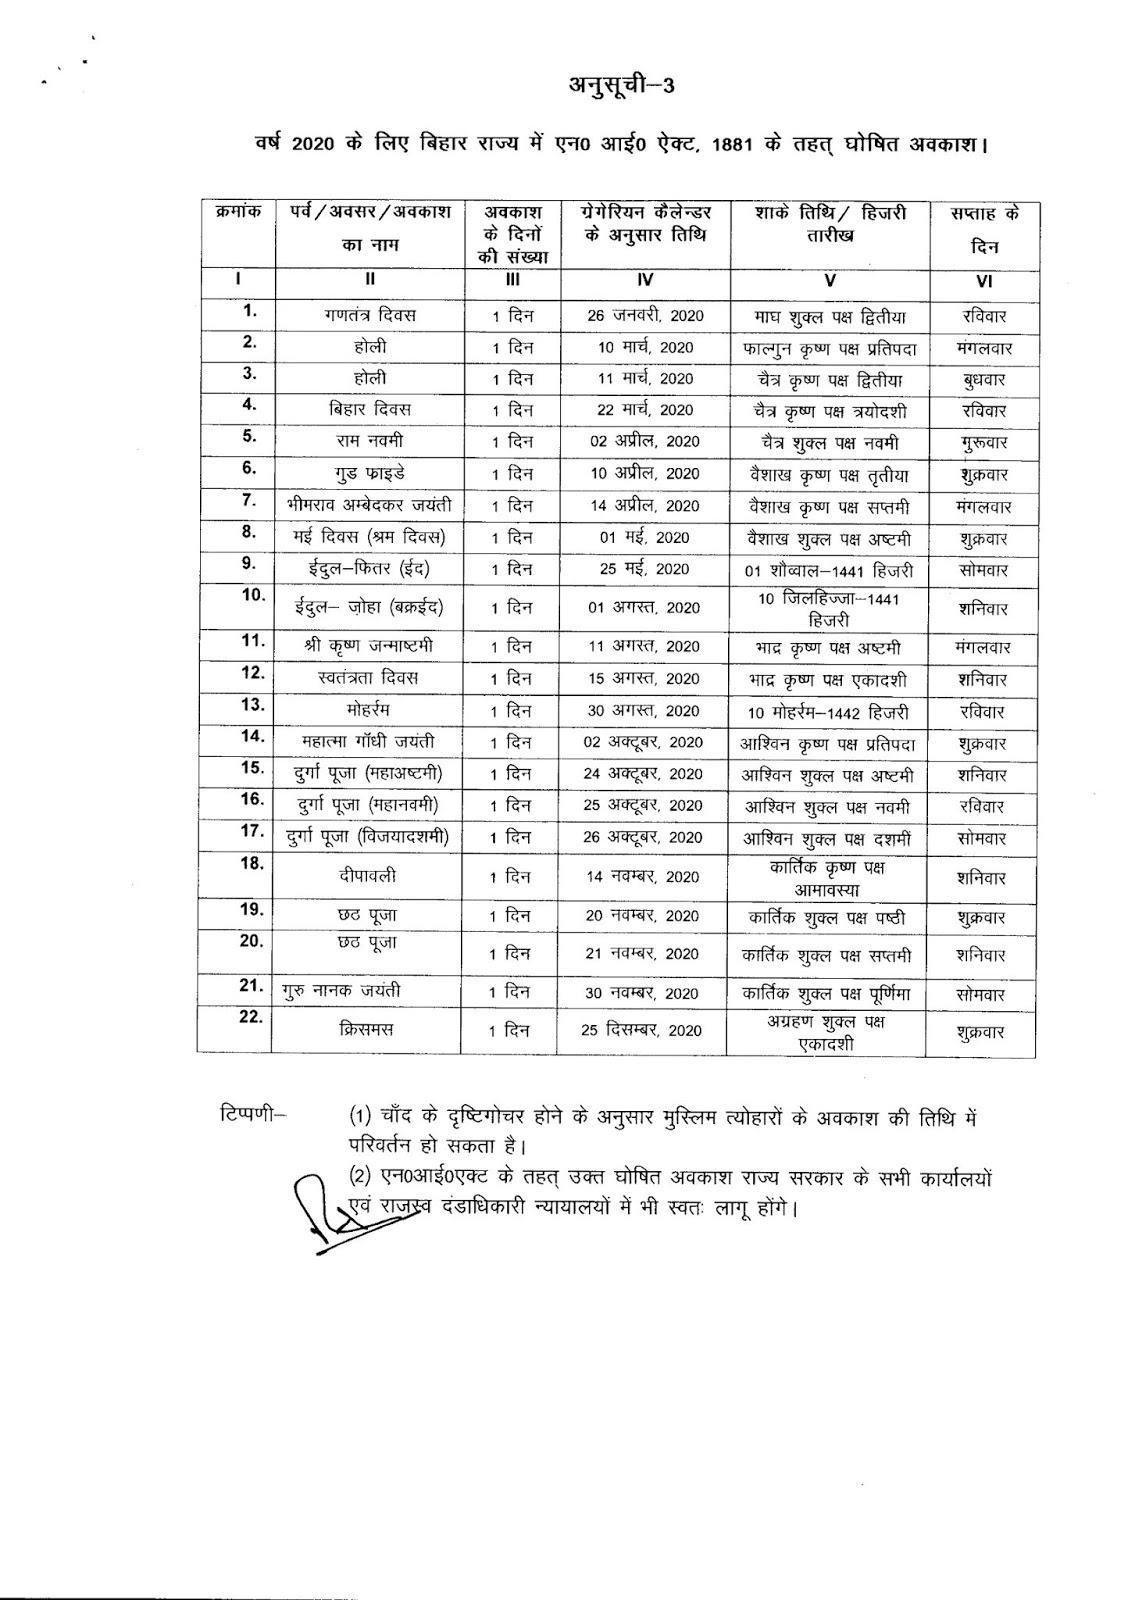 Bihar Government Calendar 2020 #educratsweb with Bihar Sarkar Calendar 2020 Pdf